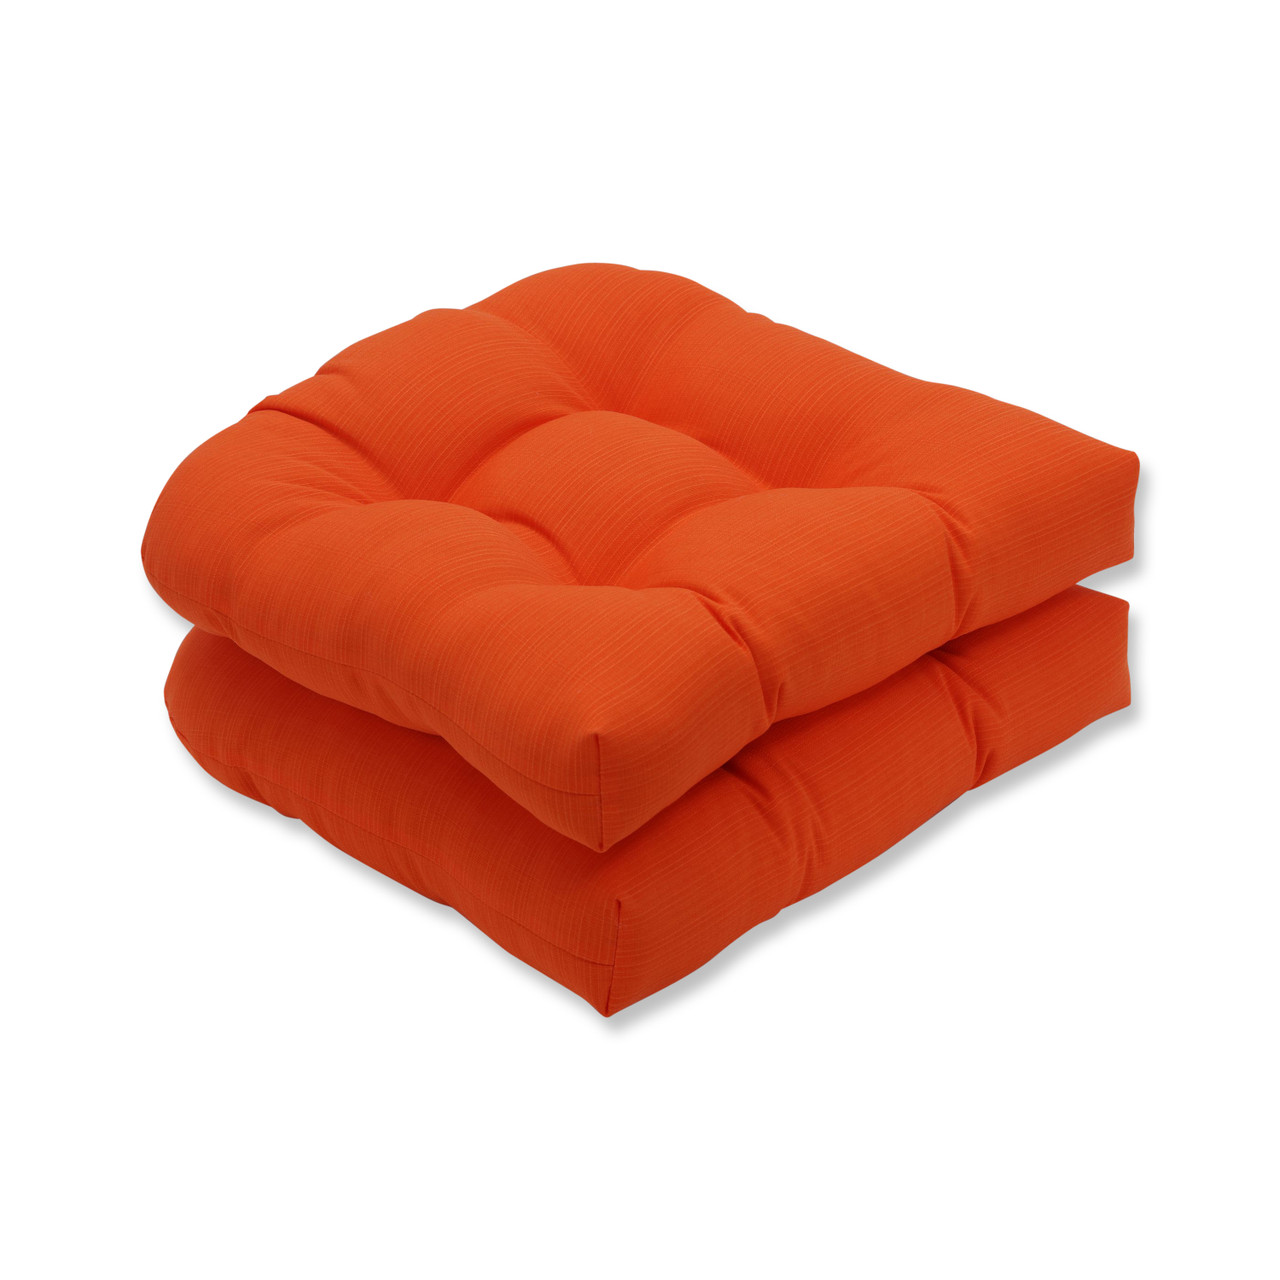 Set of 2 Orange Pillow Perfect Indoor//Outdoor Primro Wicker Seat Cushion